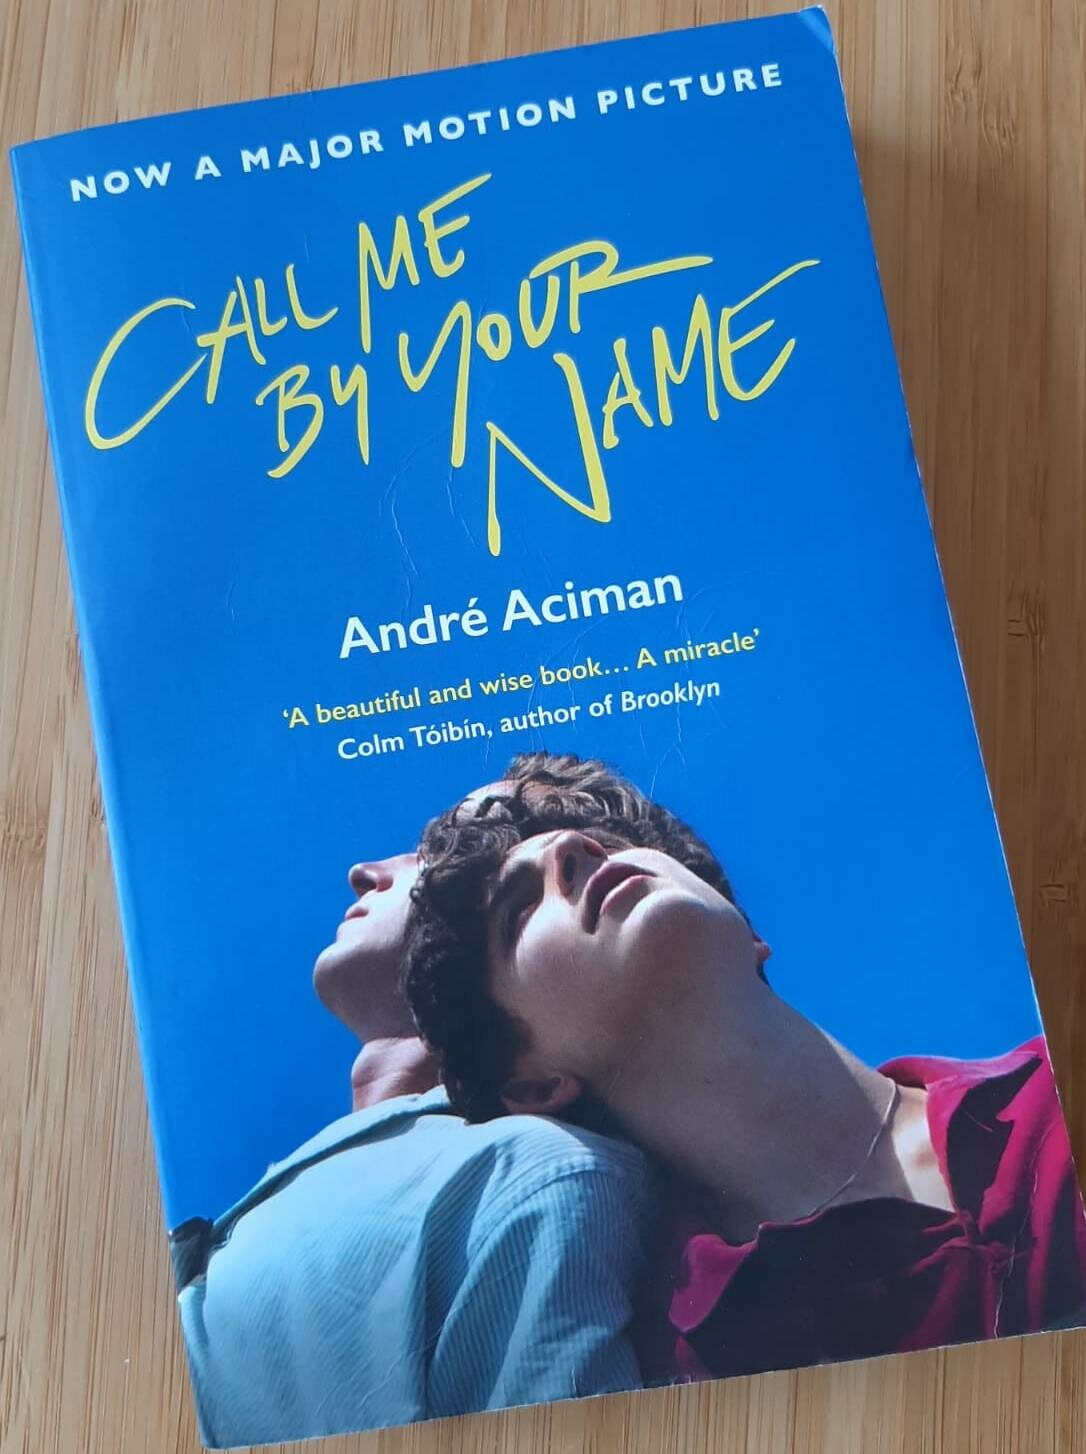 Boek van de week: Call me by your name